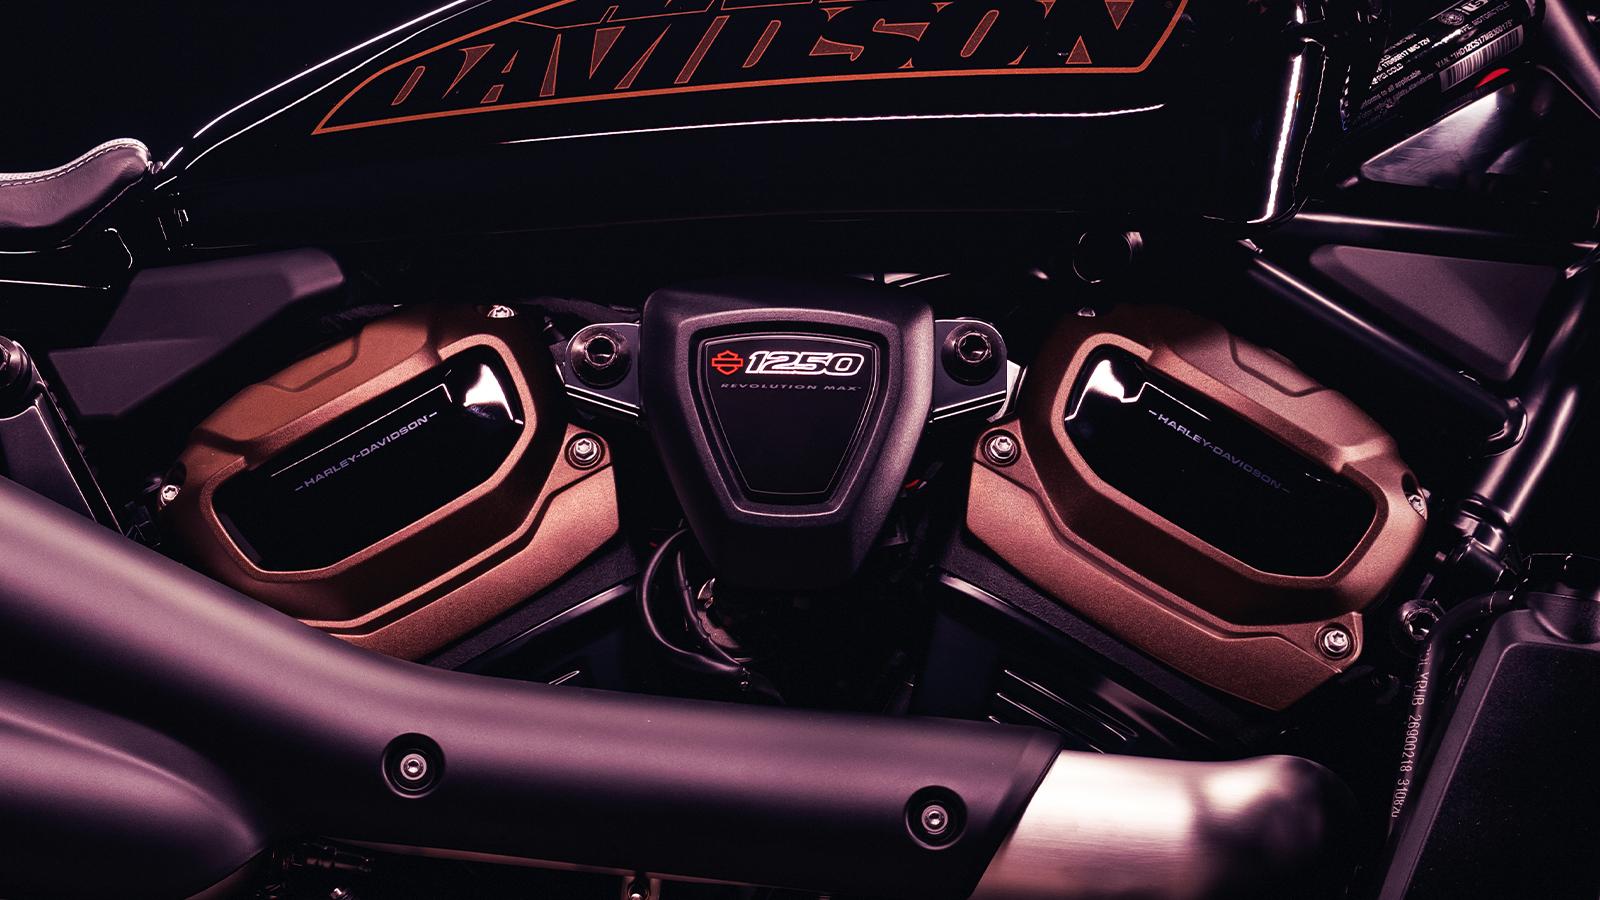 Harley-Davidson Revolution Max